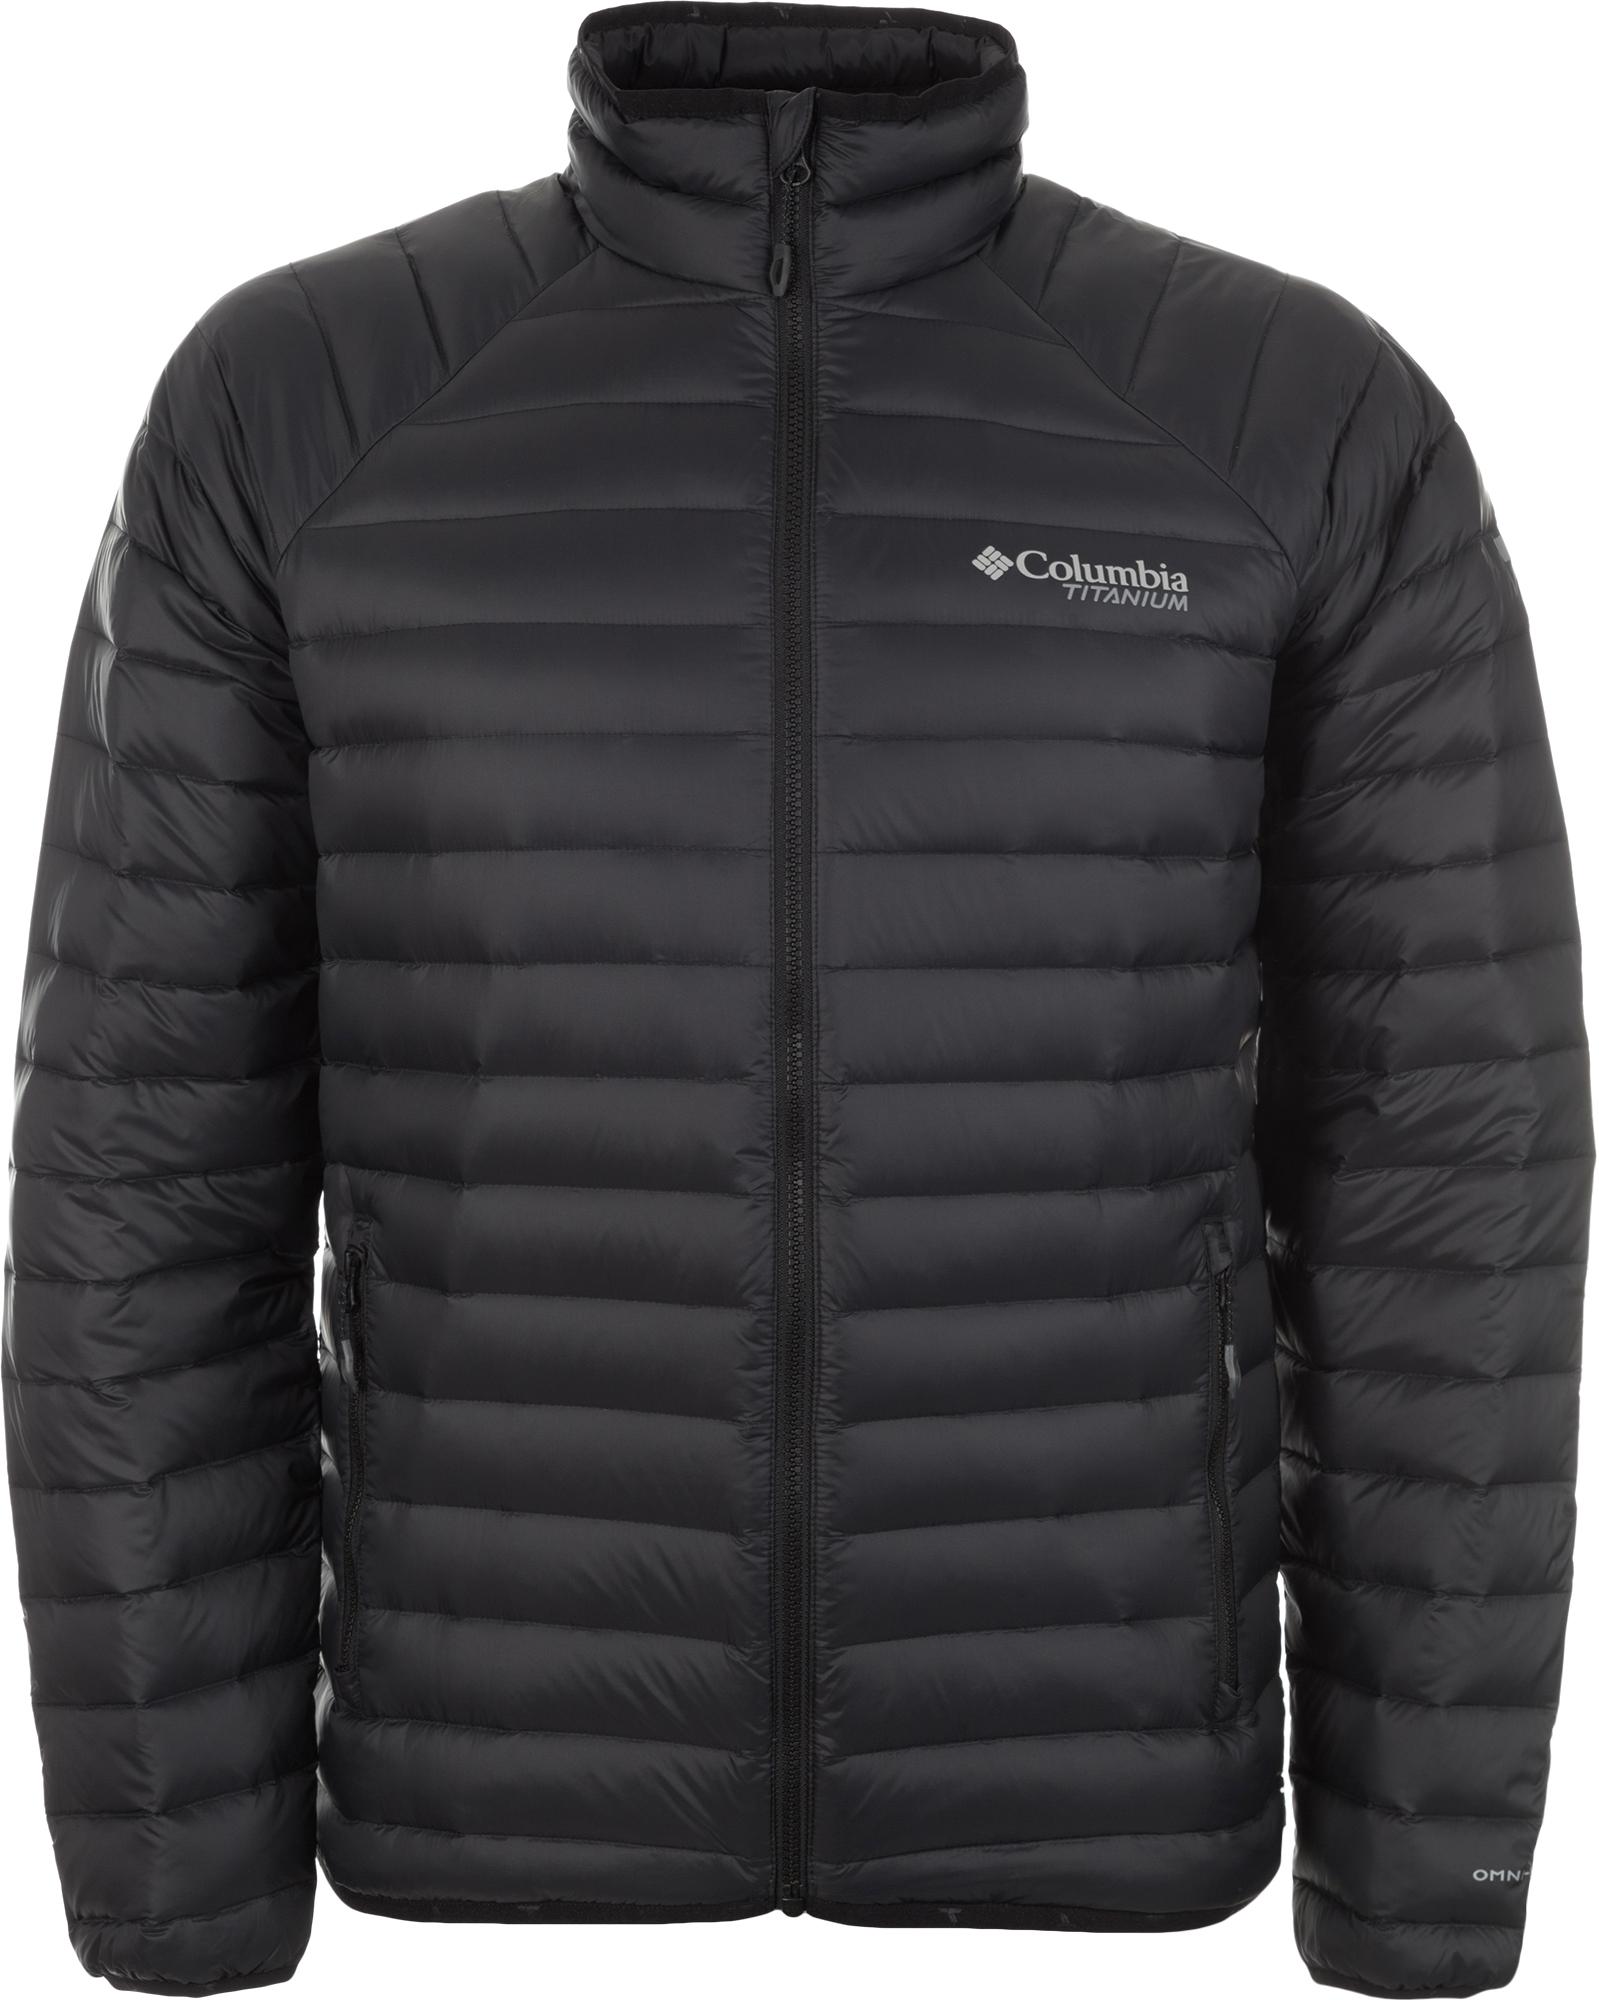 Columbia Куртка пуховая мужская Columbia Alpha Trail, размер 48-50